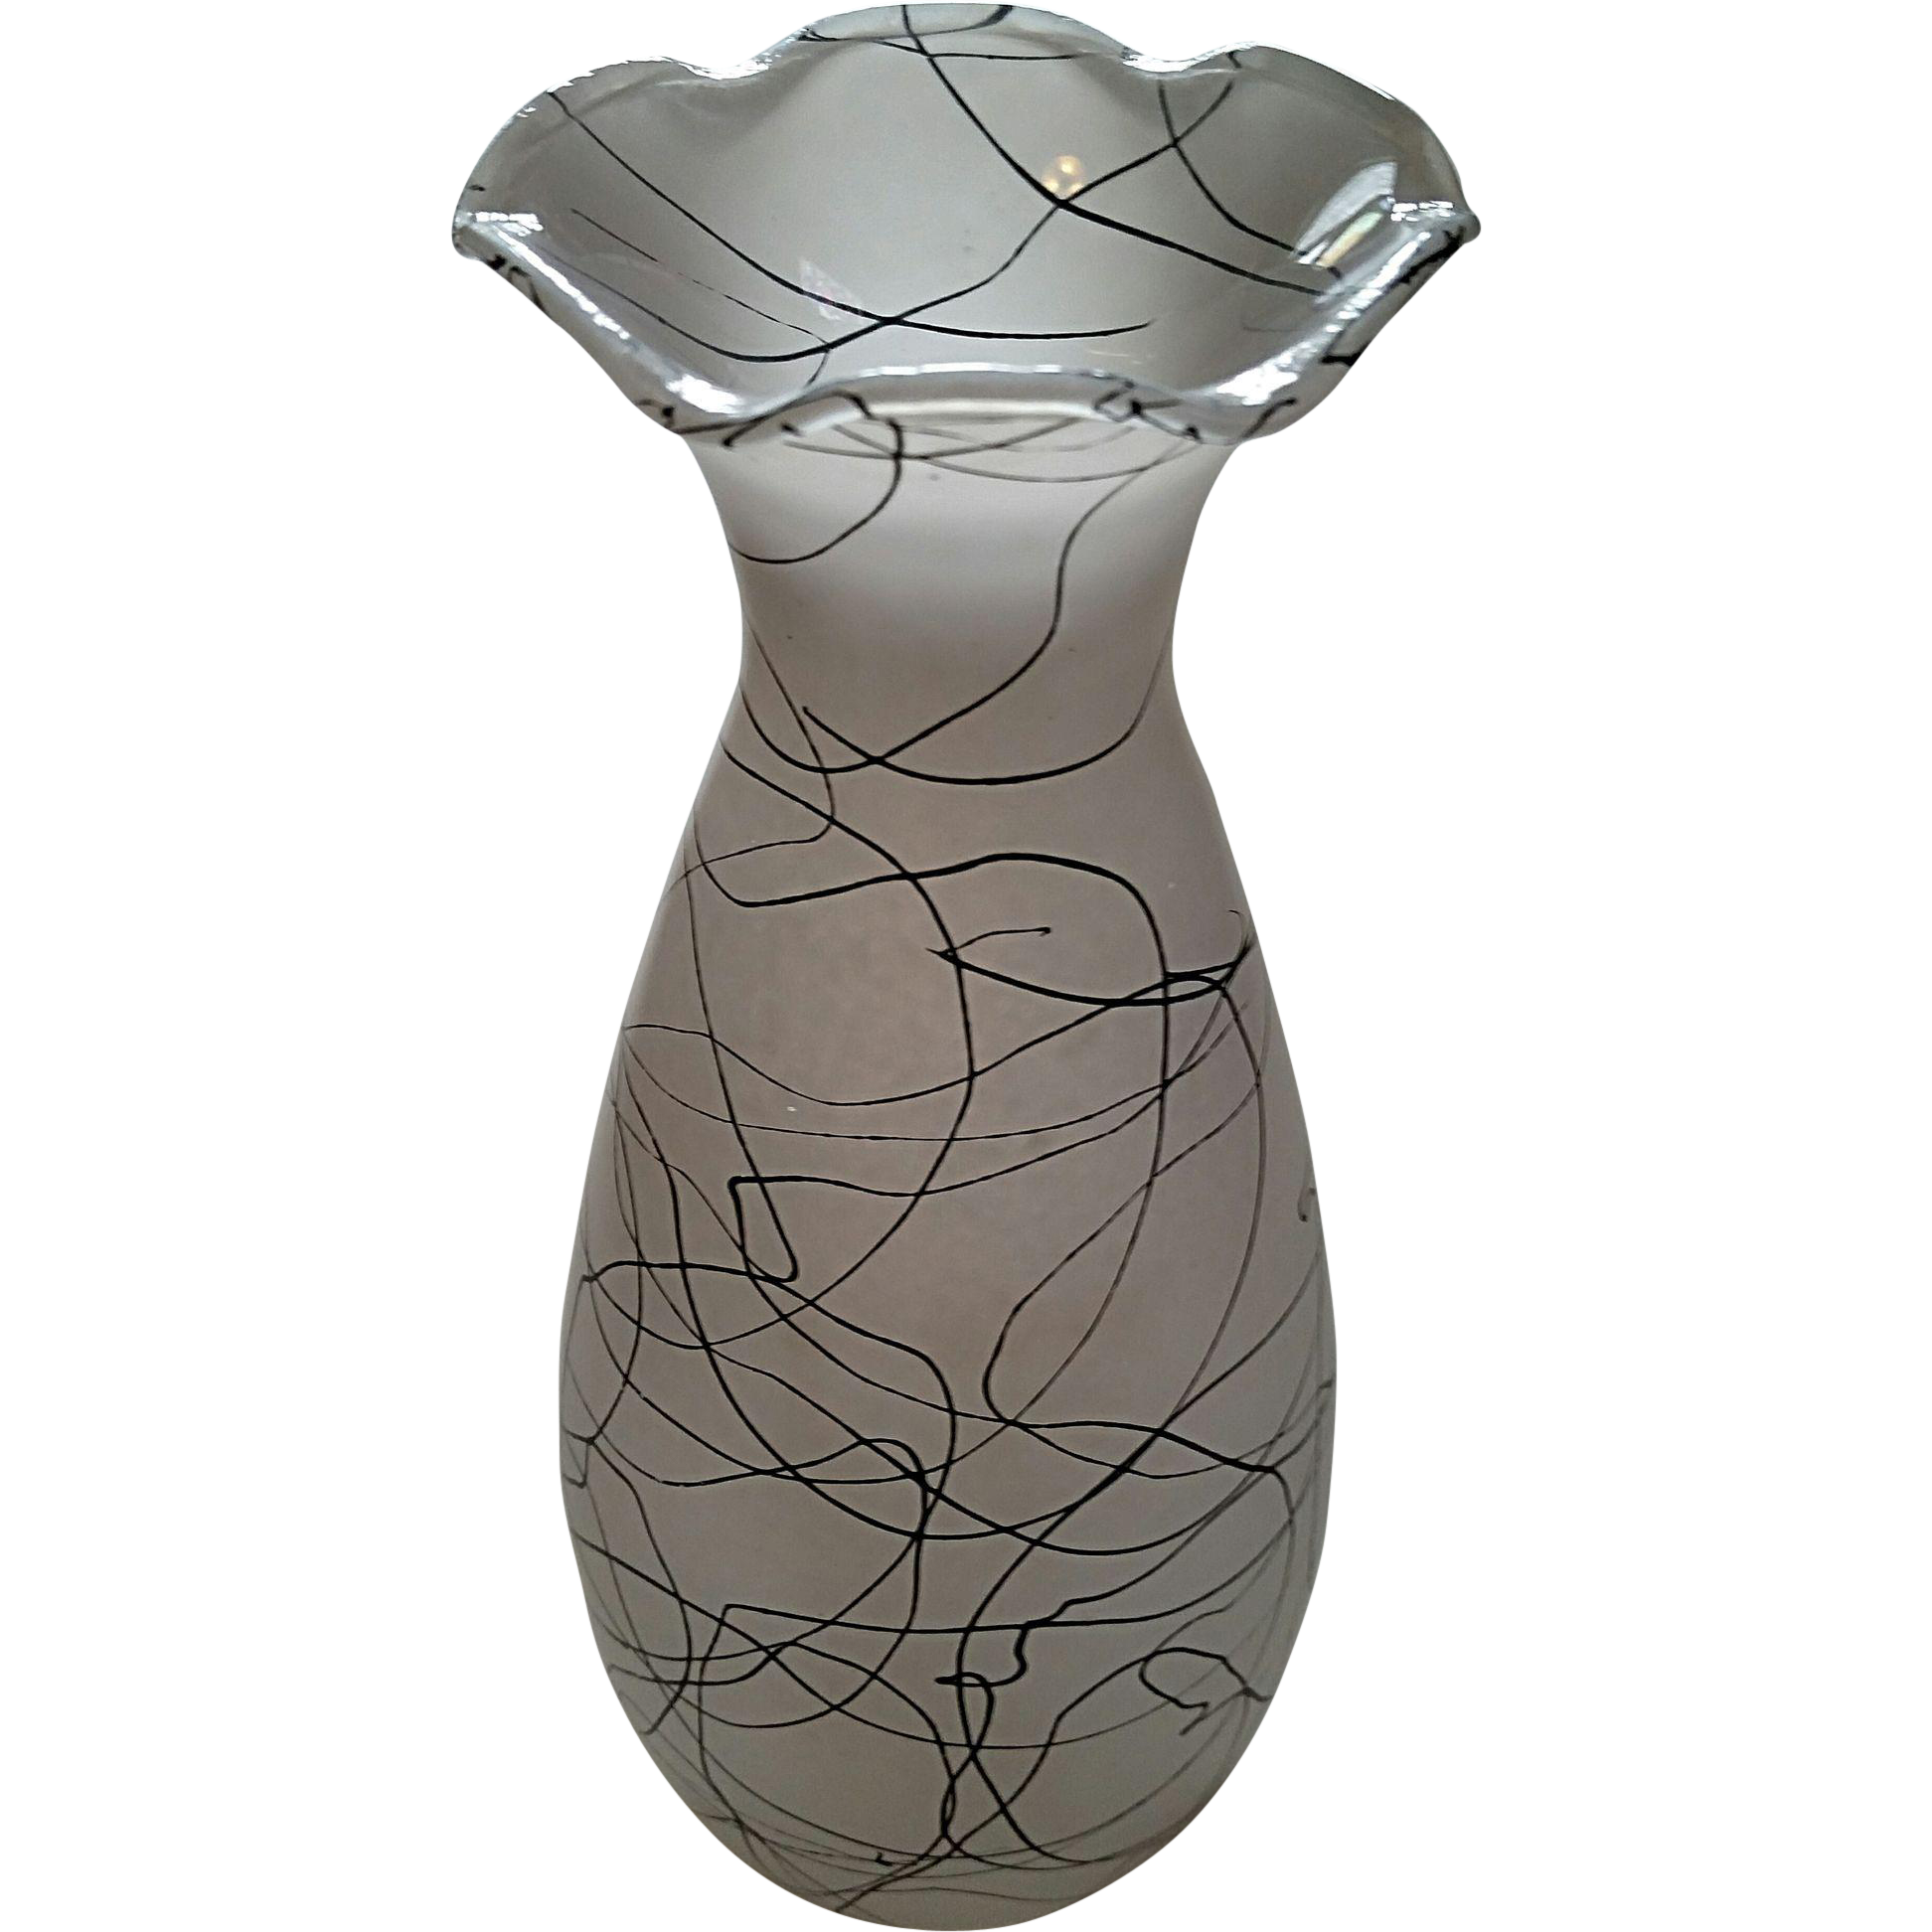 "Hazel Atlas retro ""Drizzle String"" vase"